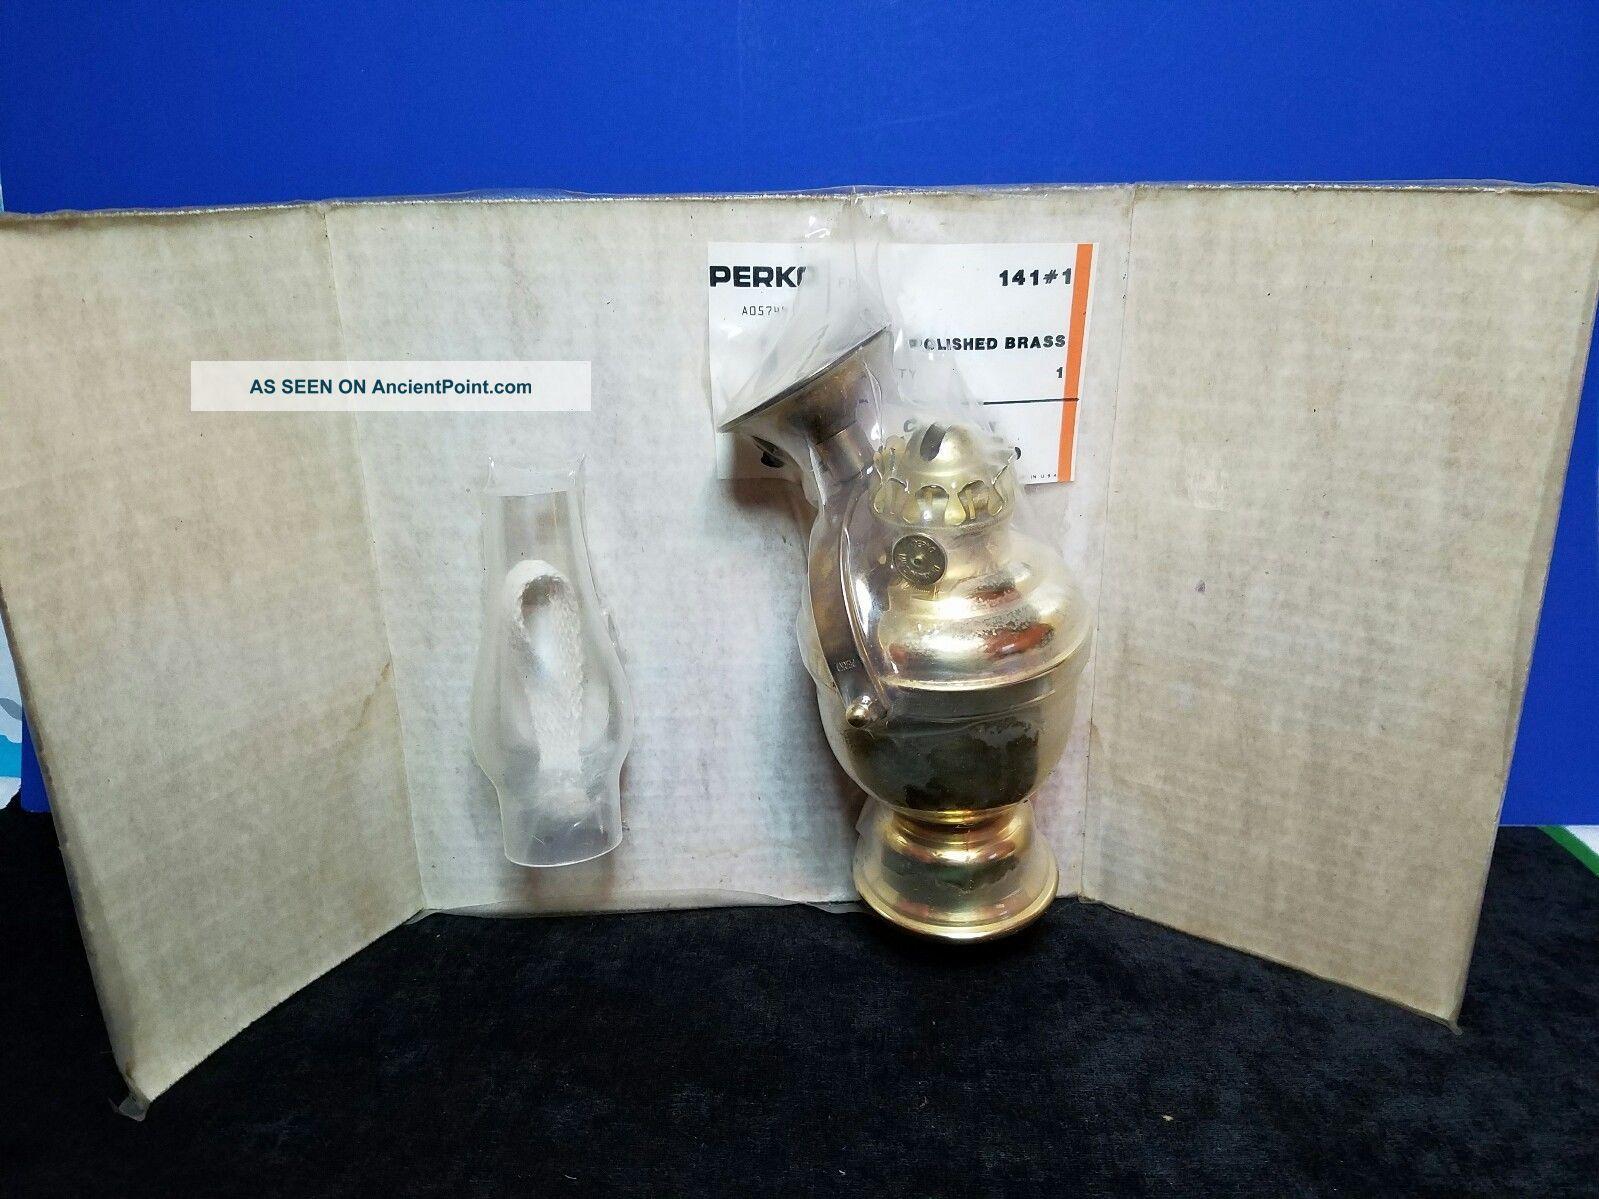 Old In Package Perko Ship Boat Maritime Cabin Brass Oil Lamp Lantern Globe Lamps & Lighting photo